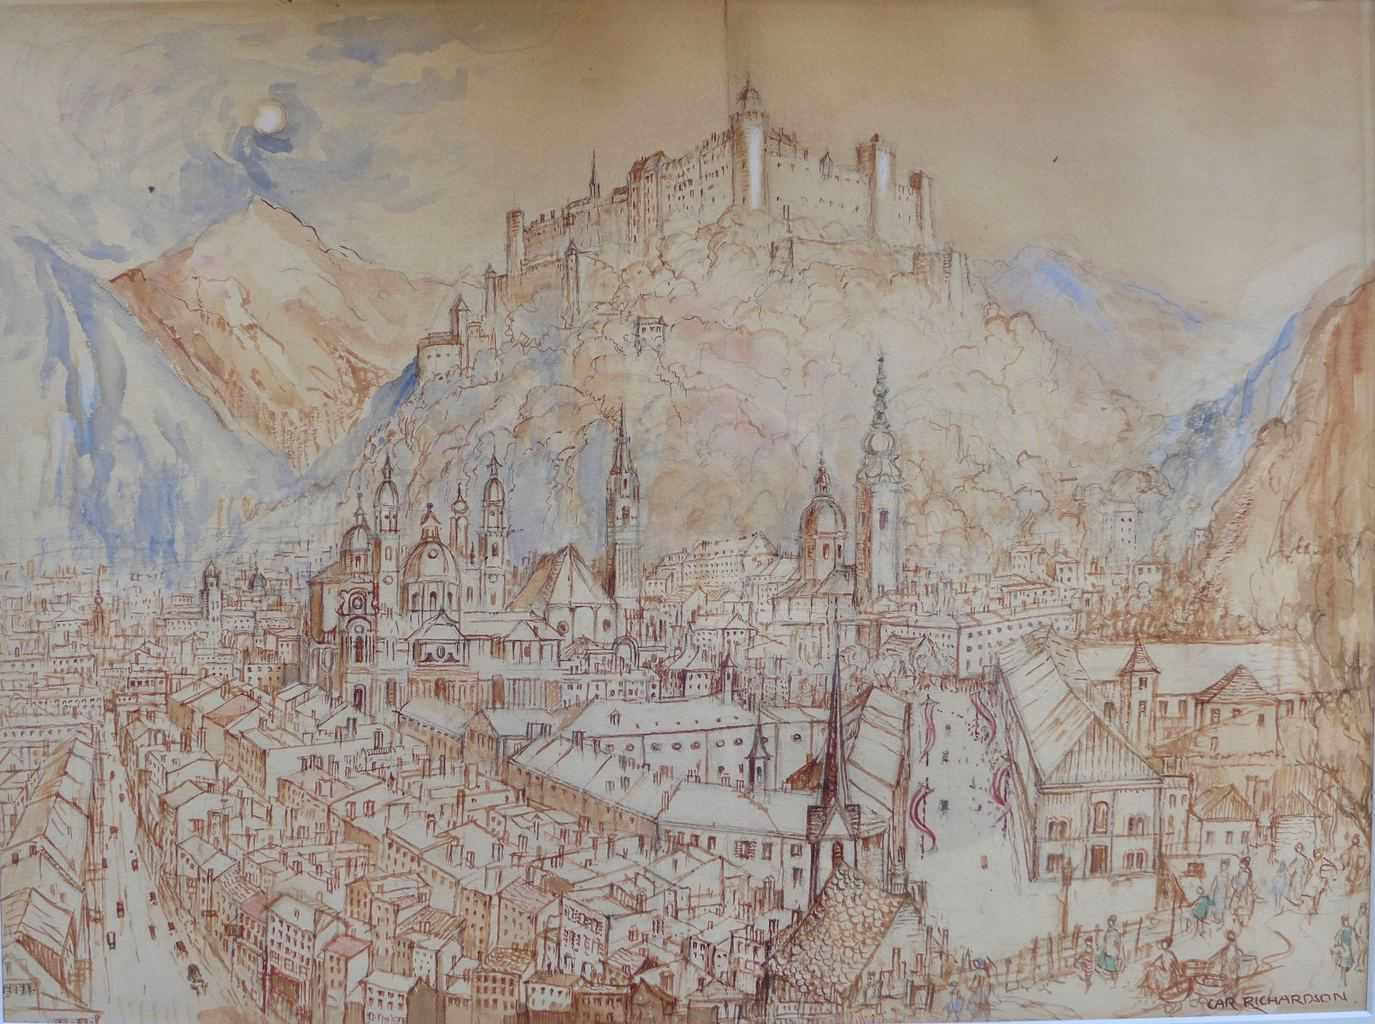 Painting by Caroline Richardson of Salzburg